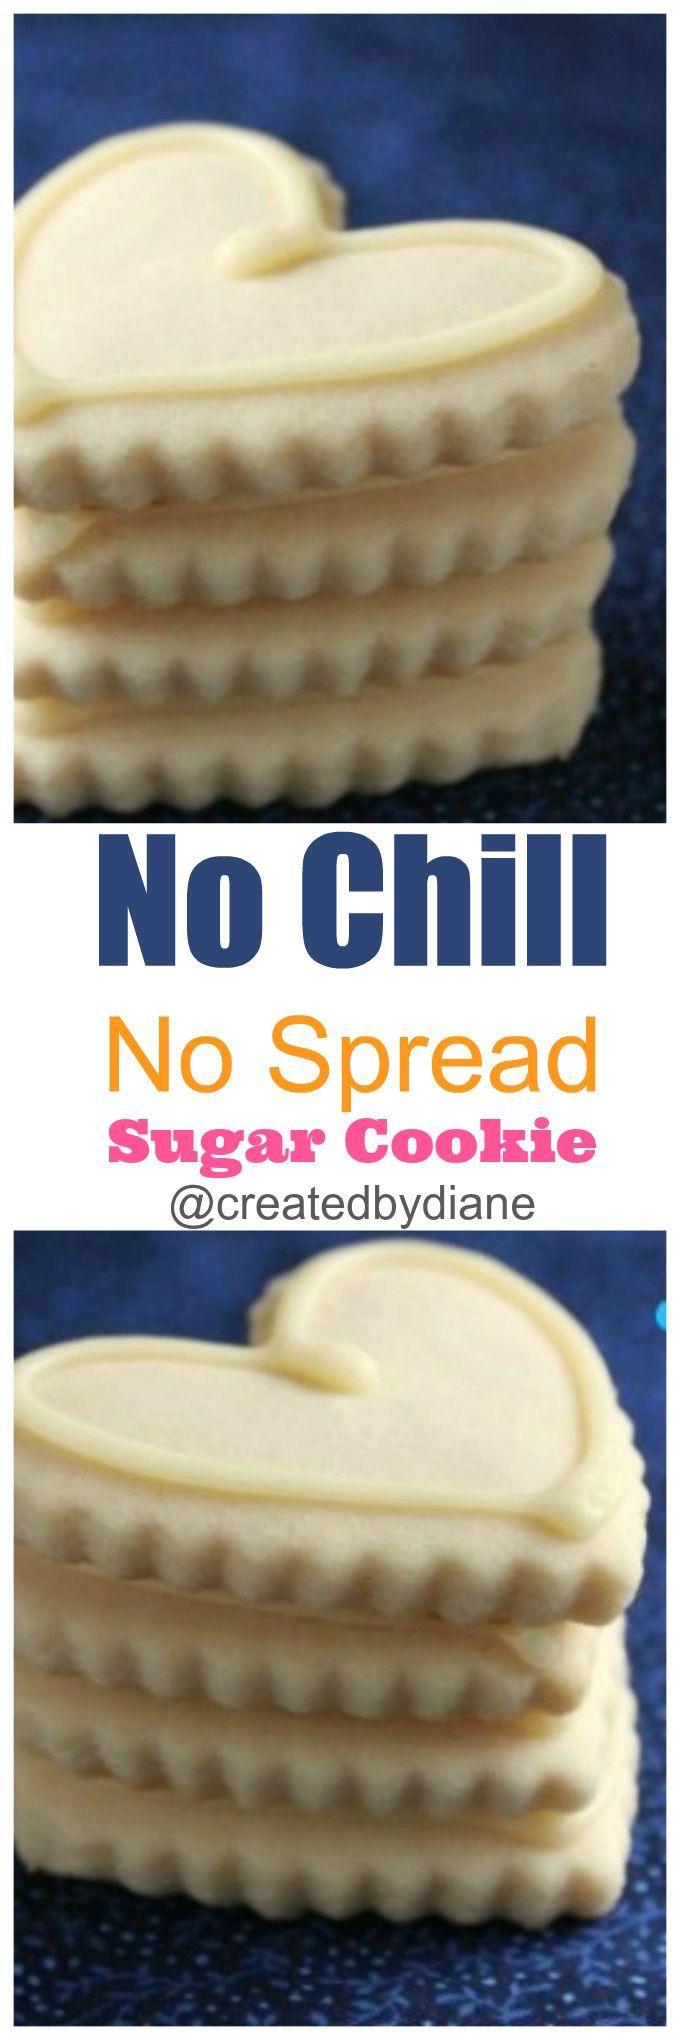 Jumbo sugar cookies recipe